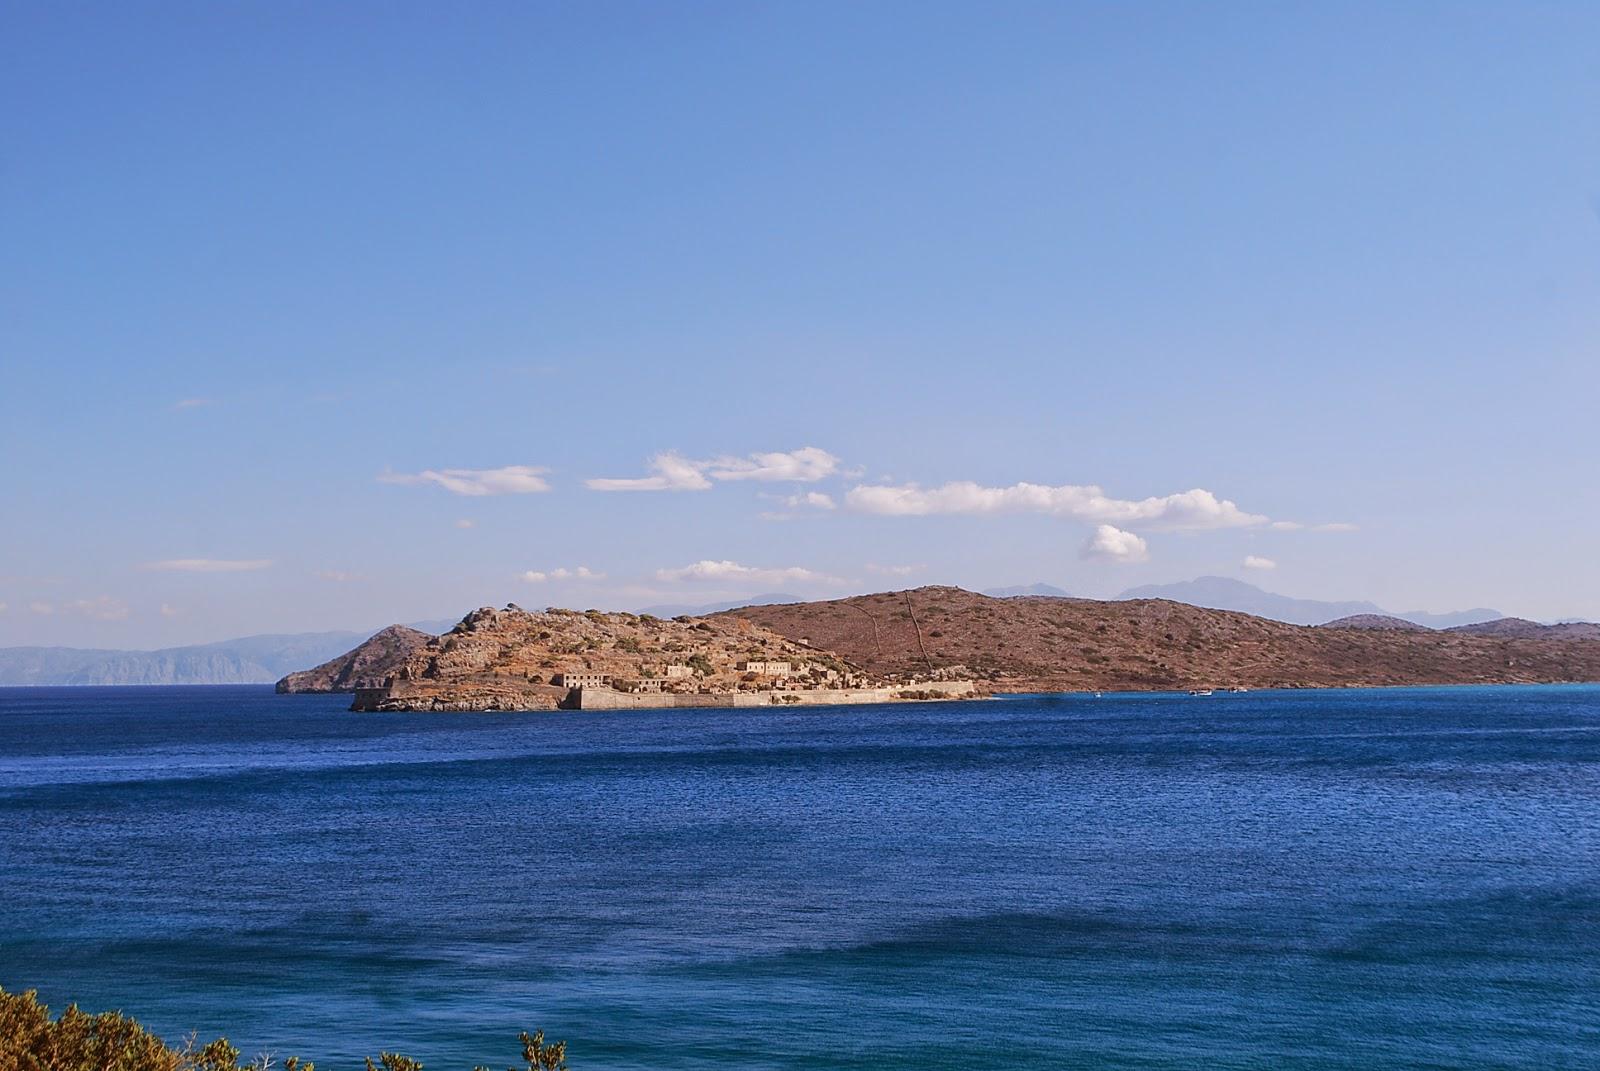 о. Крит, Греция/ Crete, Greece.